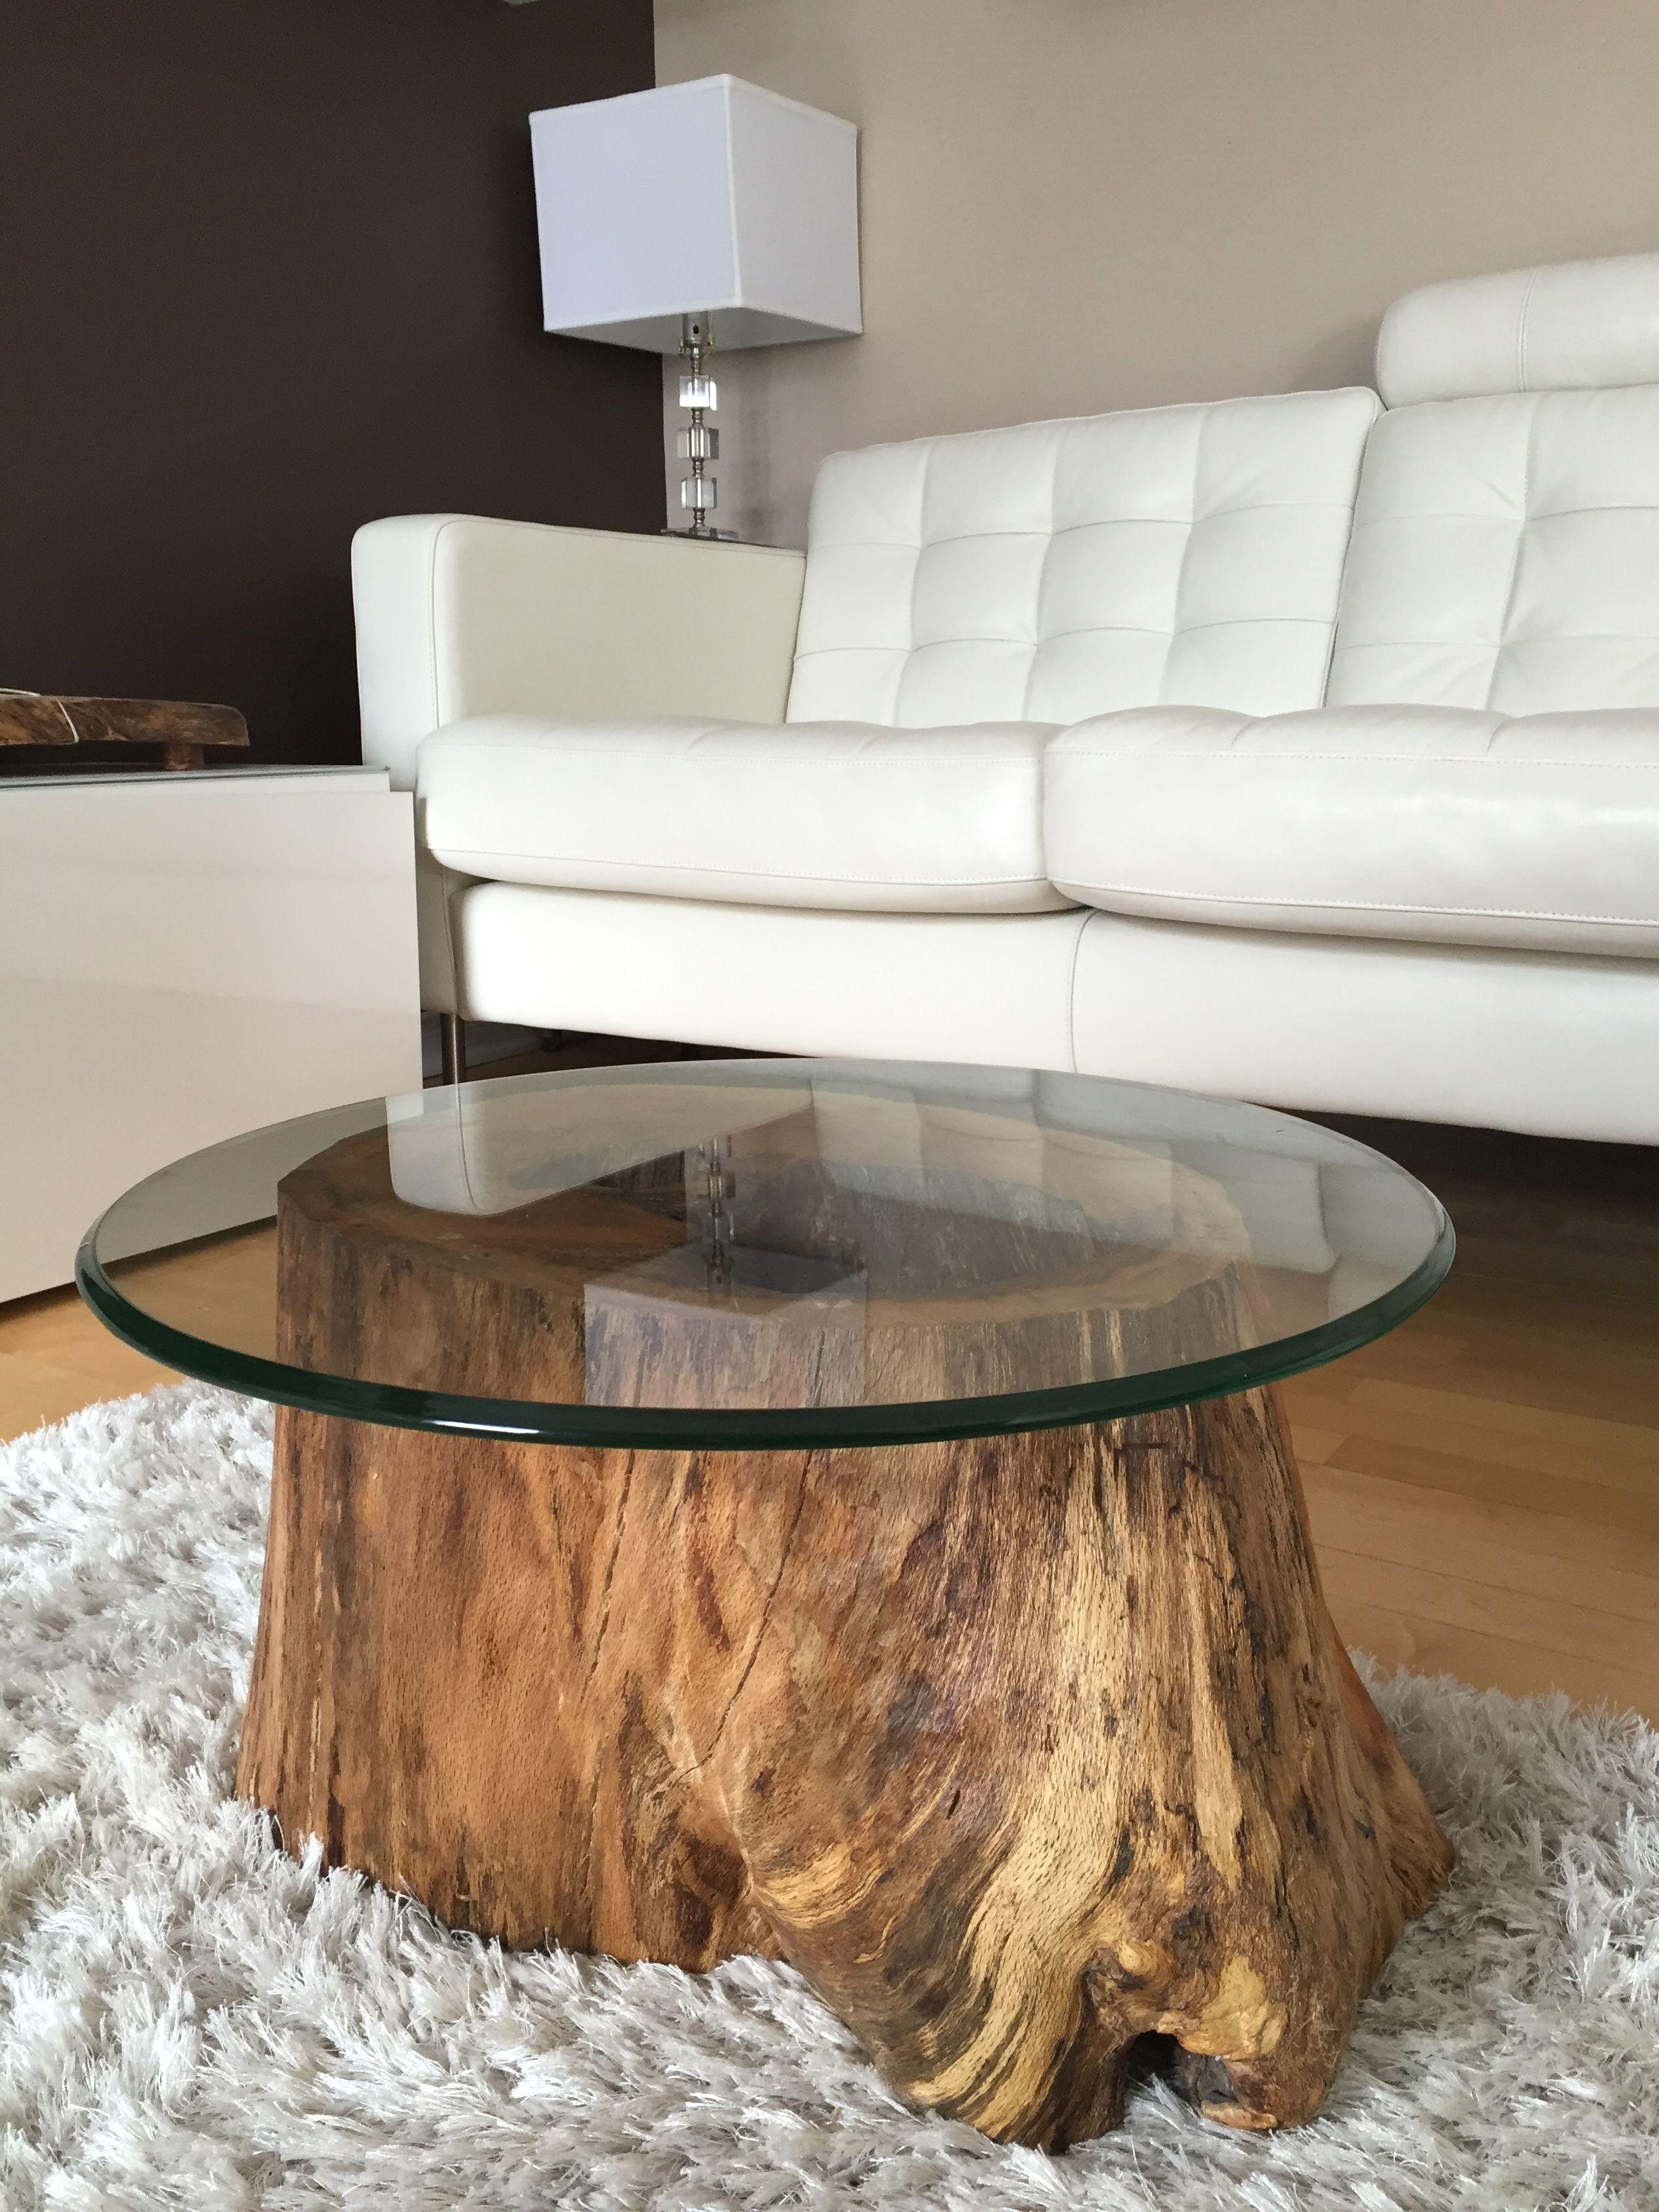 Mia Coffee Table Glass Wood Gfurn Glass Wood Table Coffee Table Wood Wood Table Design [ 1045 x 1000 Pixel ]